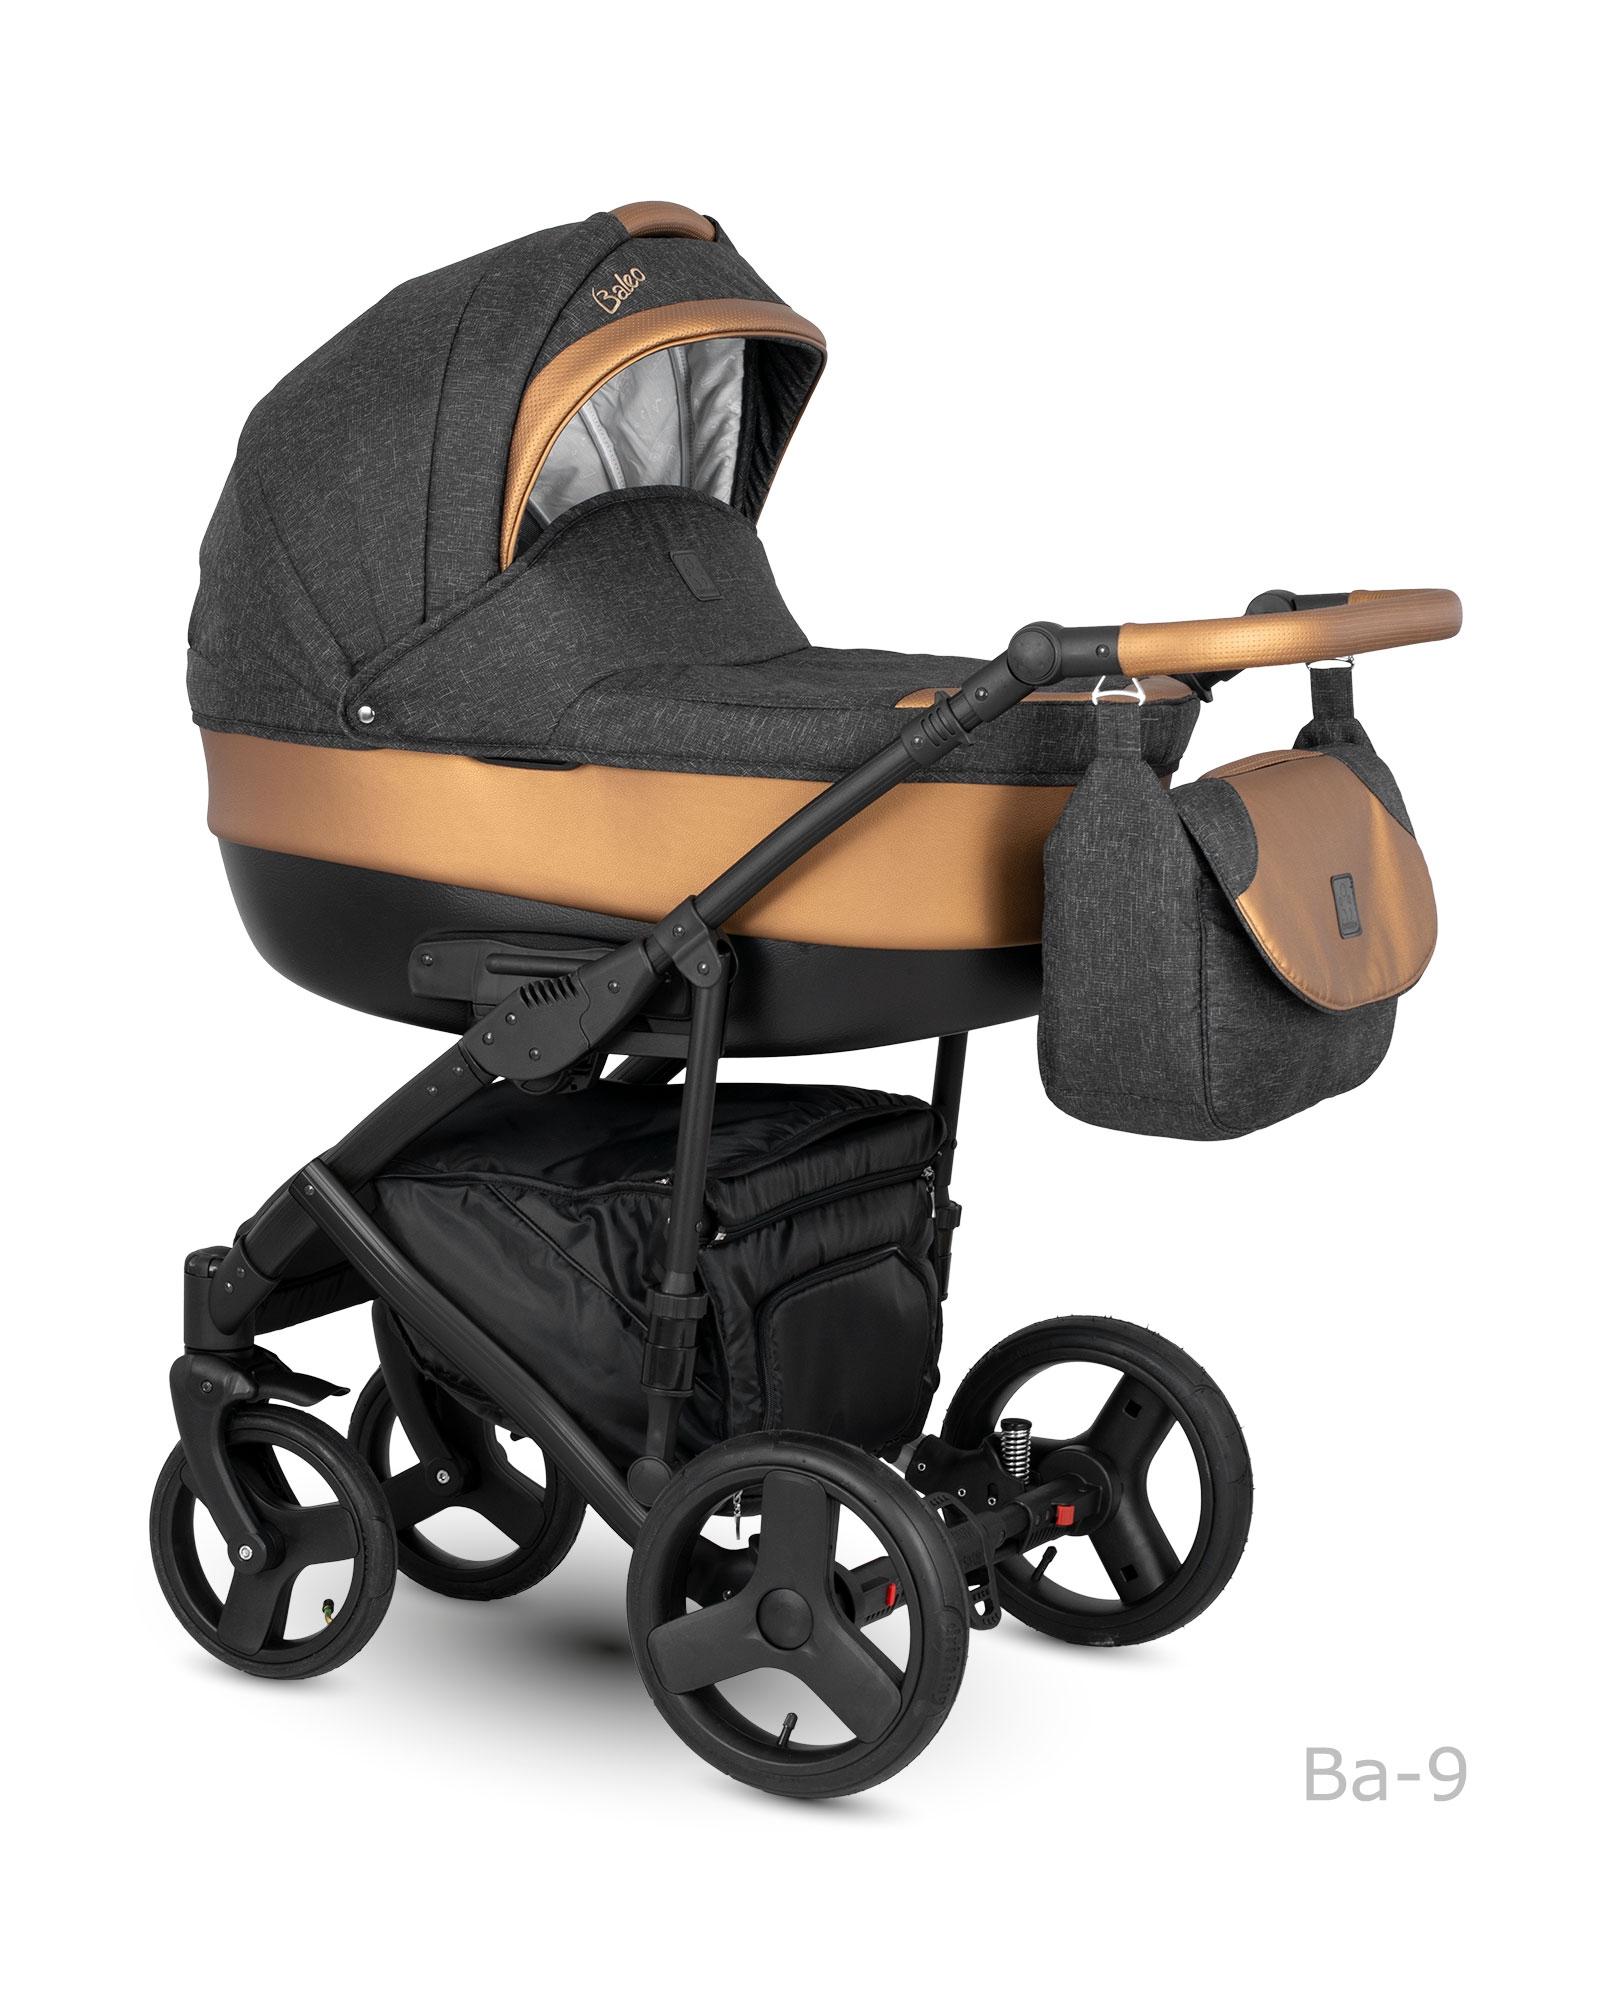 Carucior copii 3 in 1 Baleo Shine 2019 Camarelo BaS-9 imagine